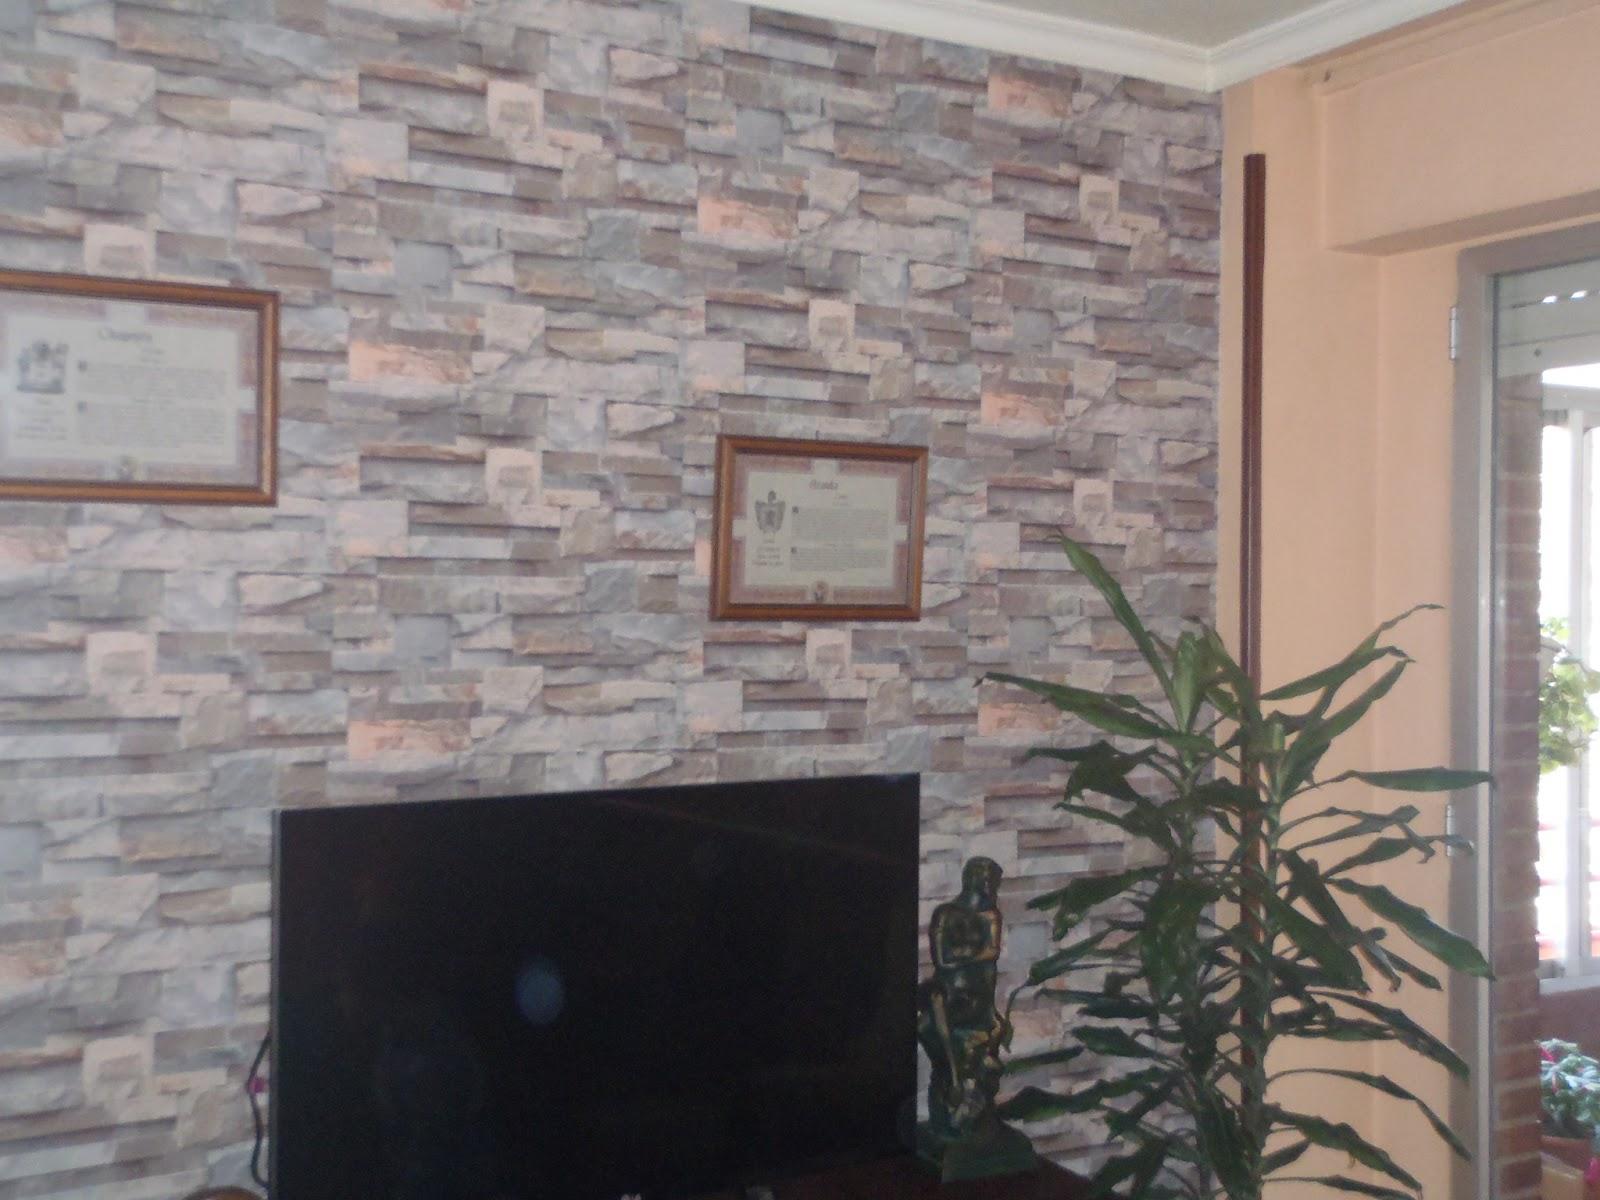 Pinturas ngel zaragoza papel pintado imitaci n piedra - Imitacion a piedra para paredes ...